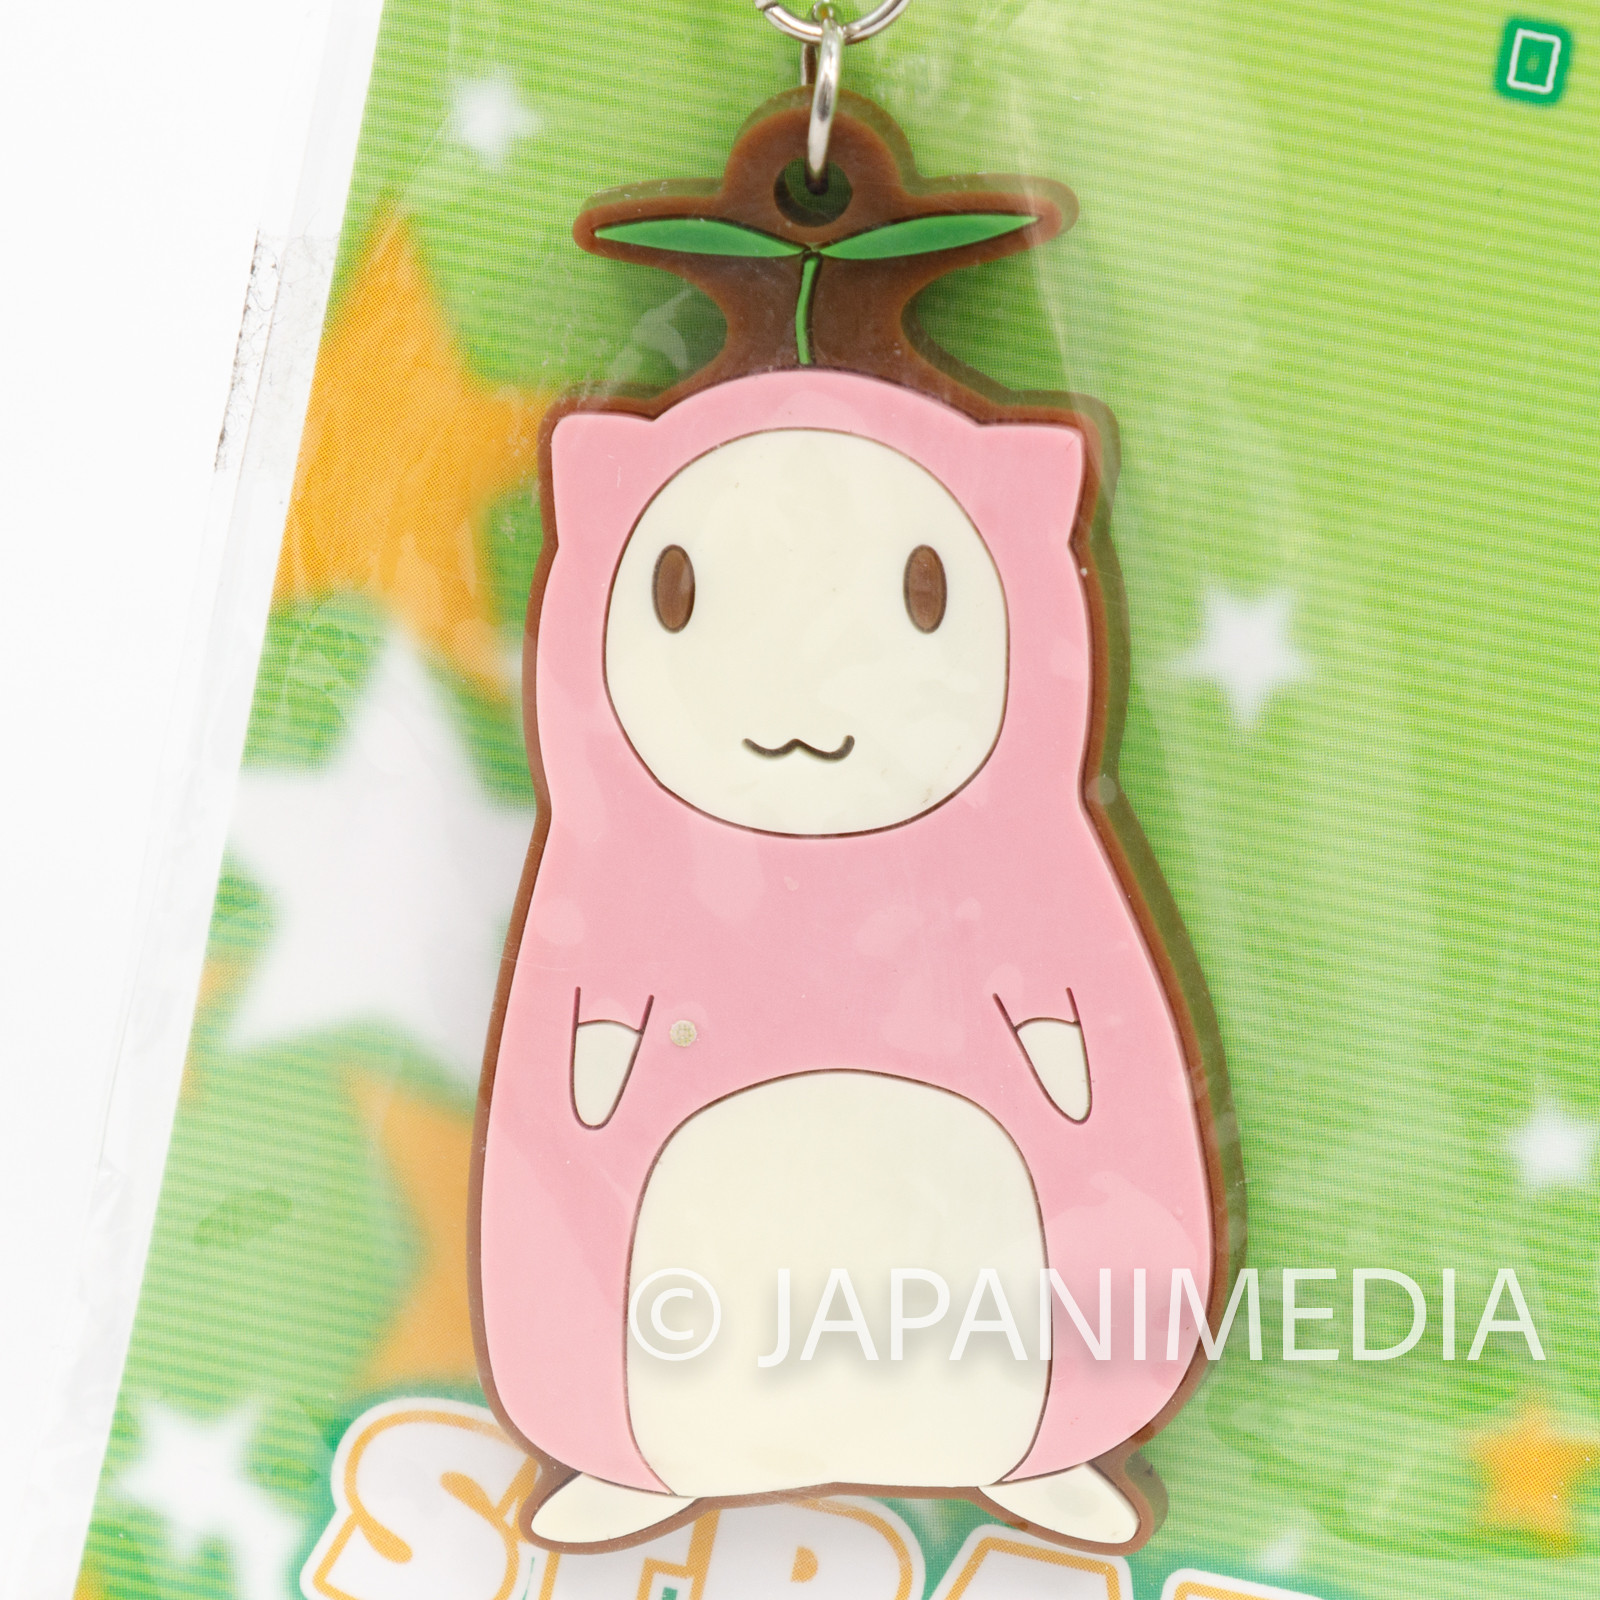 Waiting In The Summer Ano Natsu de Matteru RINON Mascot Rubber Strap JAPAN